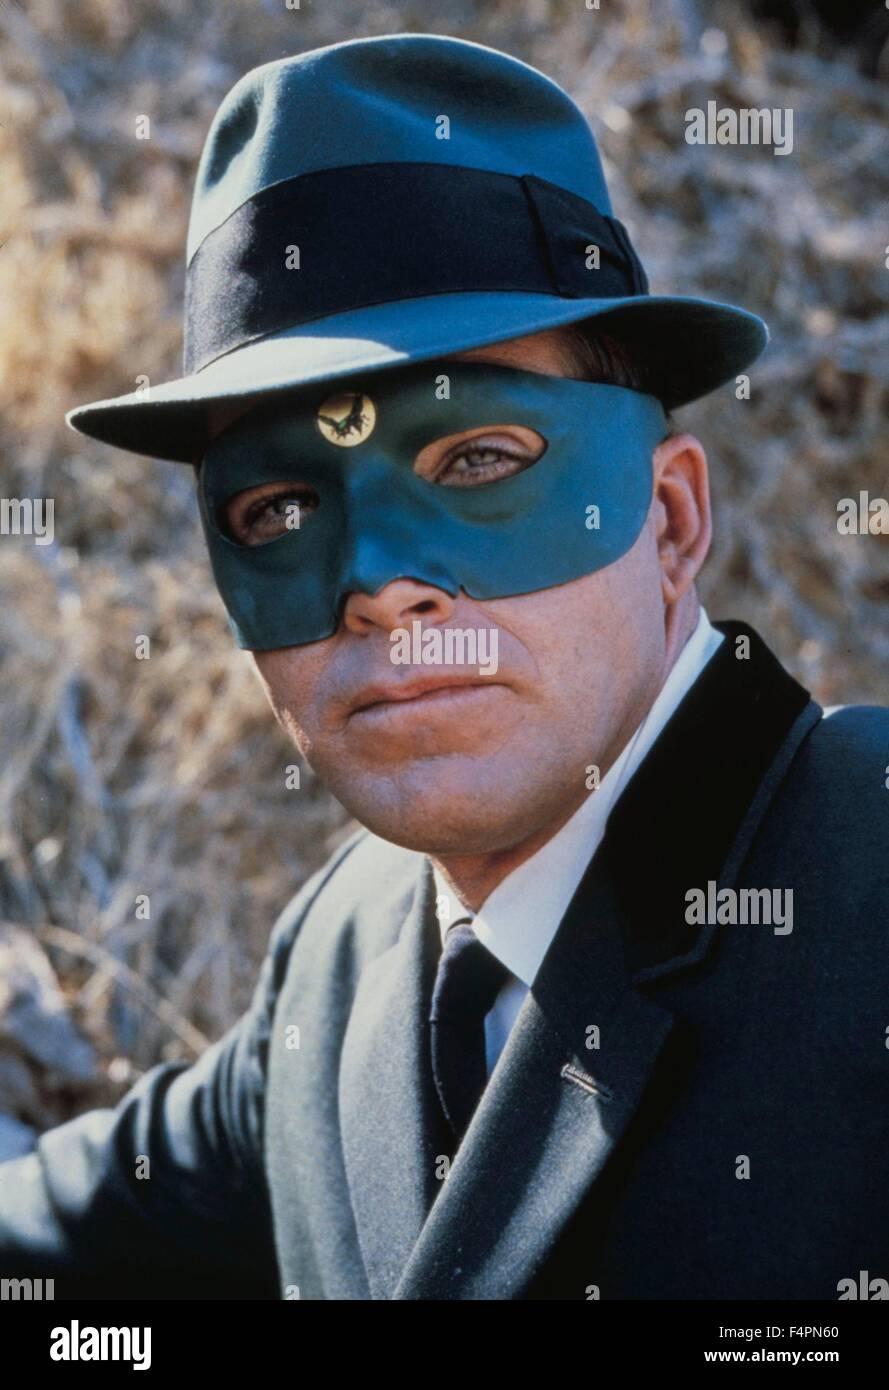 Van Williams / The Green Hornet (TV Series) / 1966-1967 created by  George W. Trendle [Twentieth Century Fox Television] Stock Photo